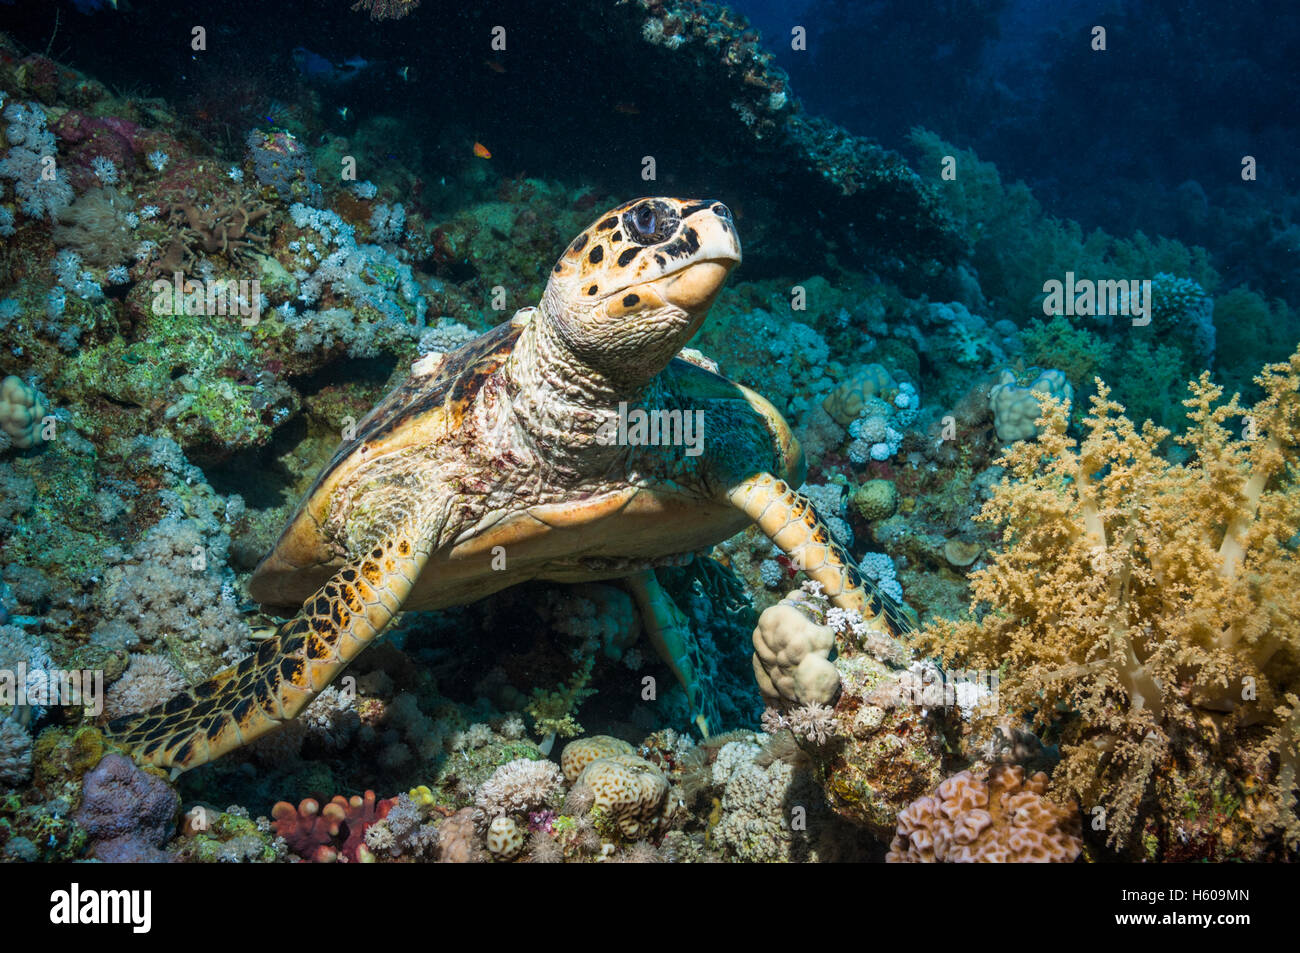 Hawksbill turtle (Eremochelys imbricata).  Egypt, Red Sea. - Stock Image